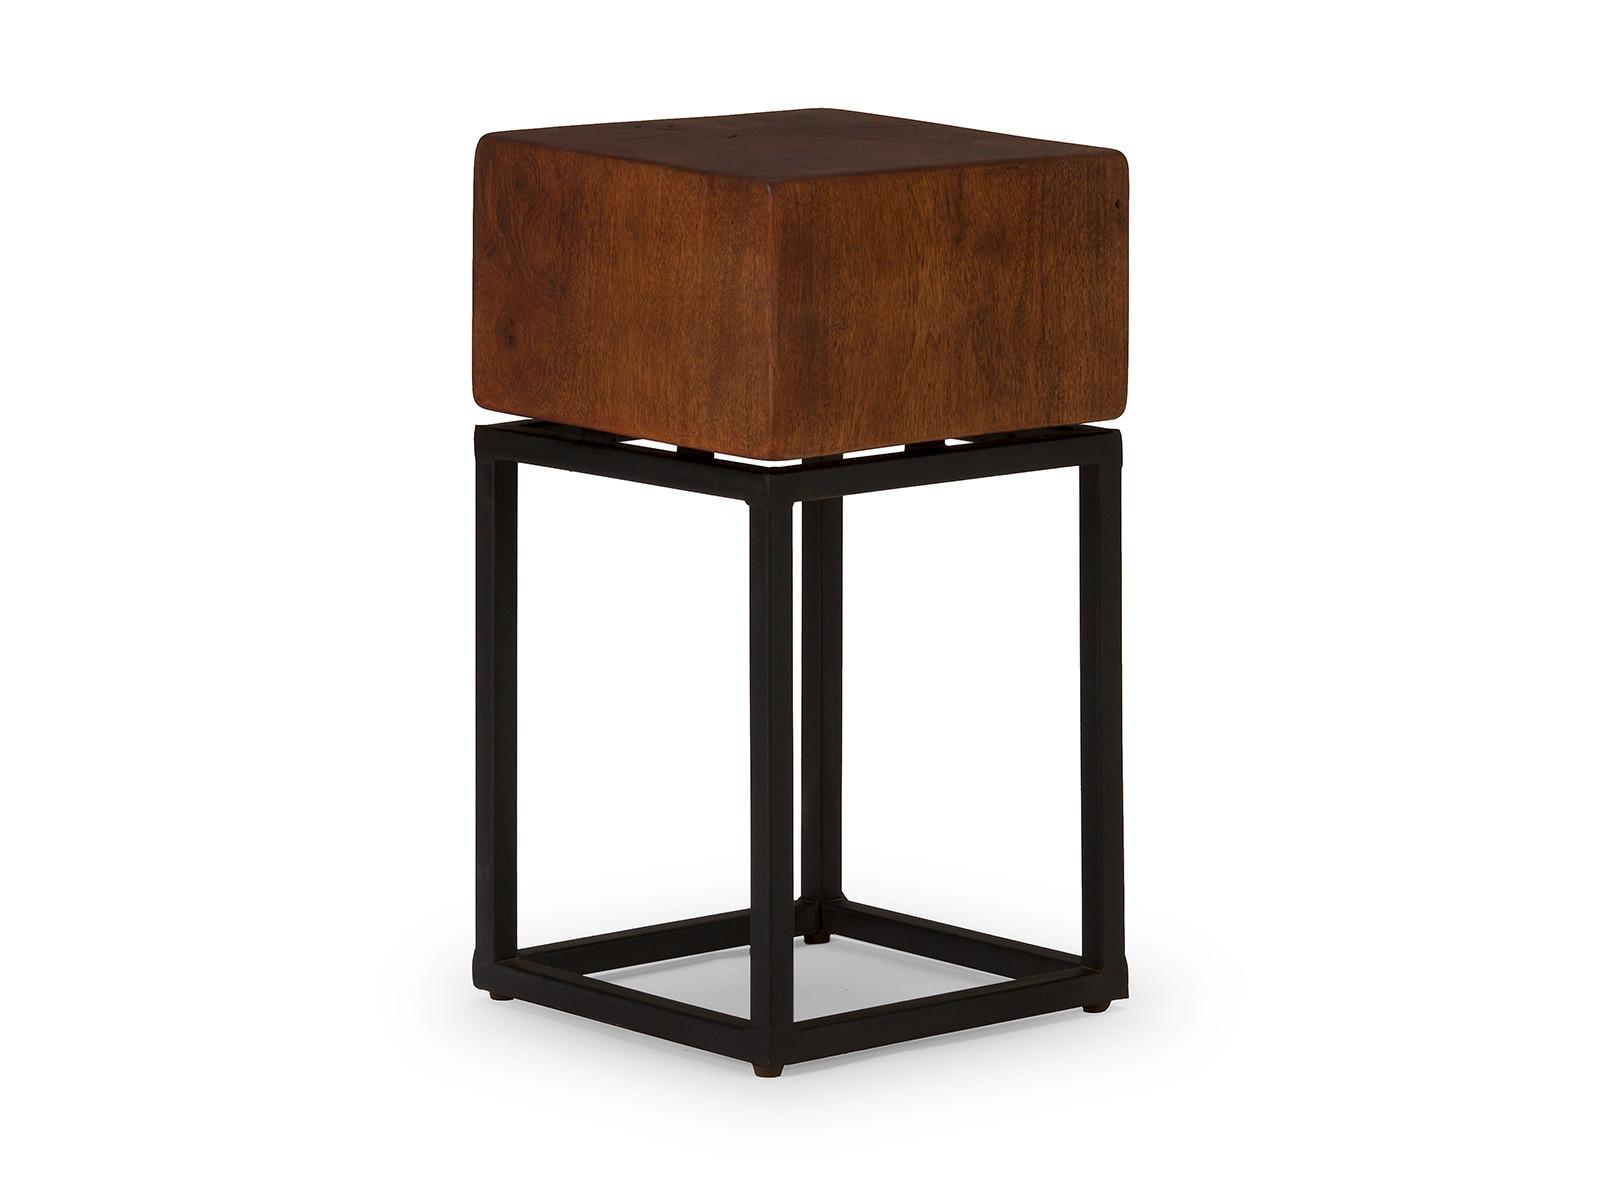 industrial hocker cube braun industrie look sitzm bel industrial shabby. Black Bedroom Furniture Sets. Home Design Ideas